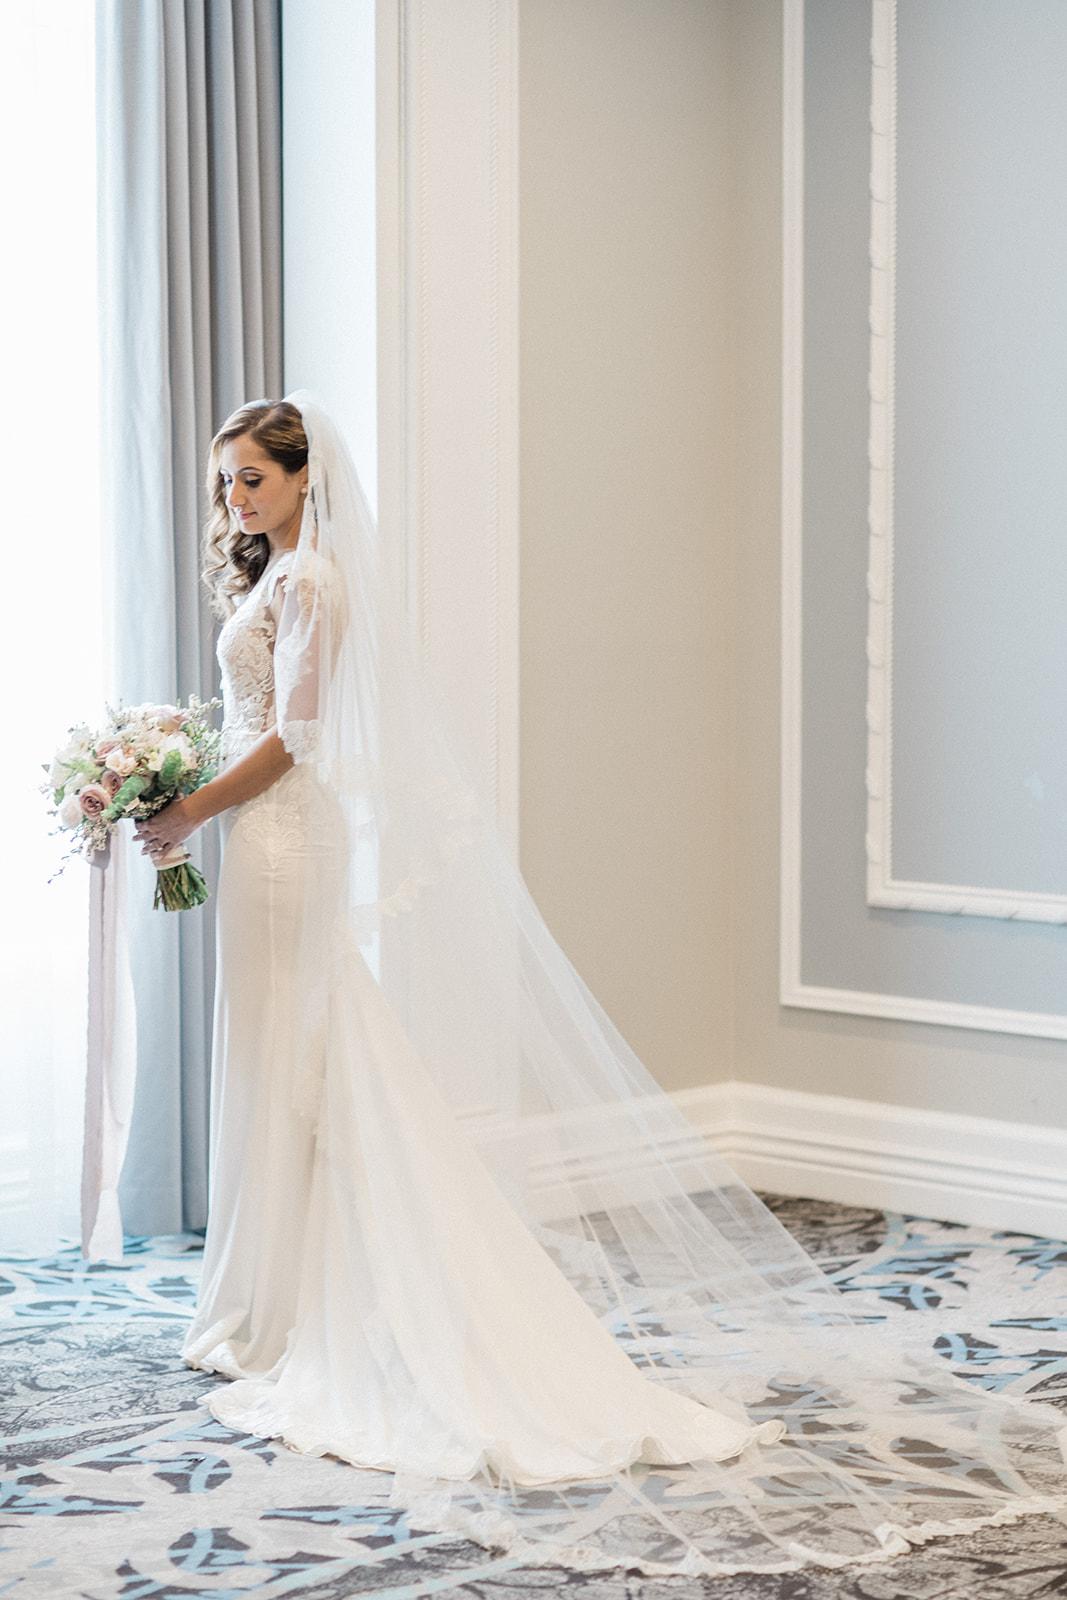 LisaCatherinePhotography_Jasmeen&Darren_Wedding-1072_websize.jpg